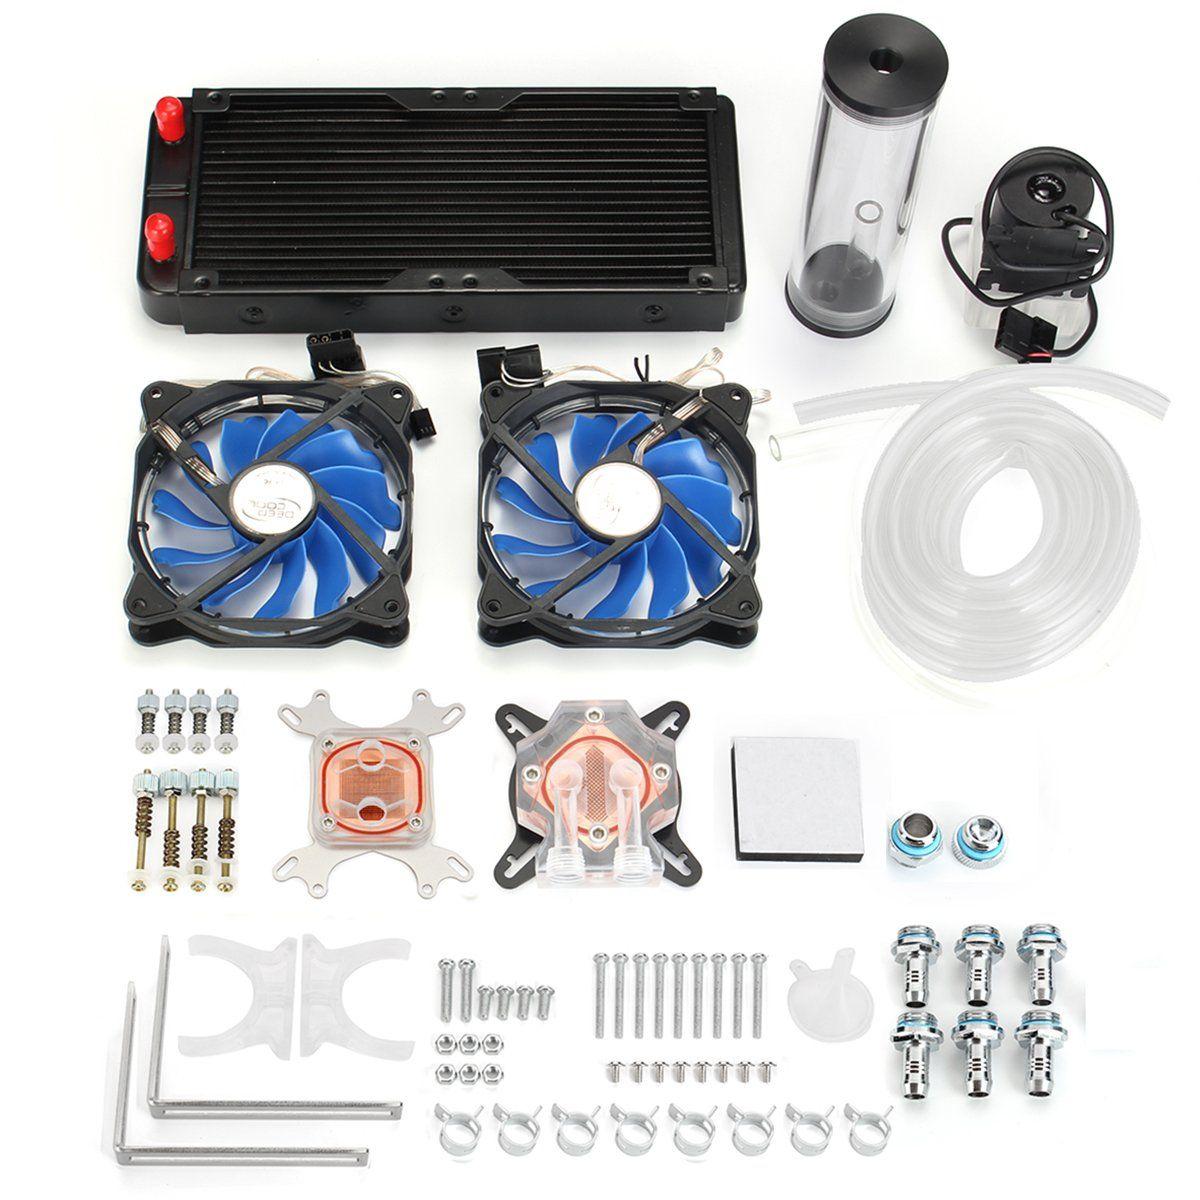 Pc Water Cooling Kit 240mm Radiator Pump Reservoir Cpu Block Rigid Tubes Diy Water Cooling Pumps Radiators